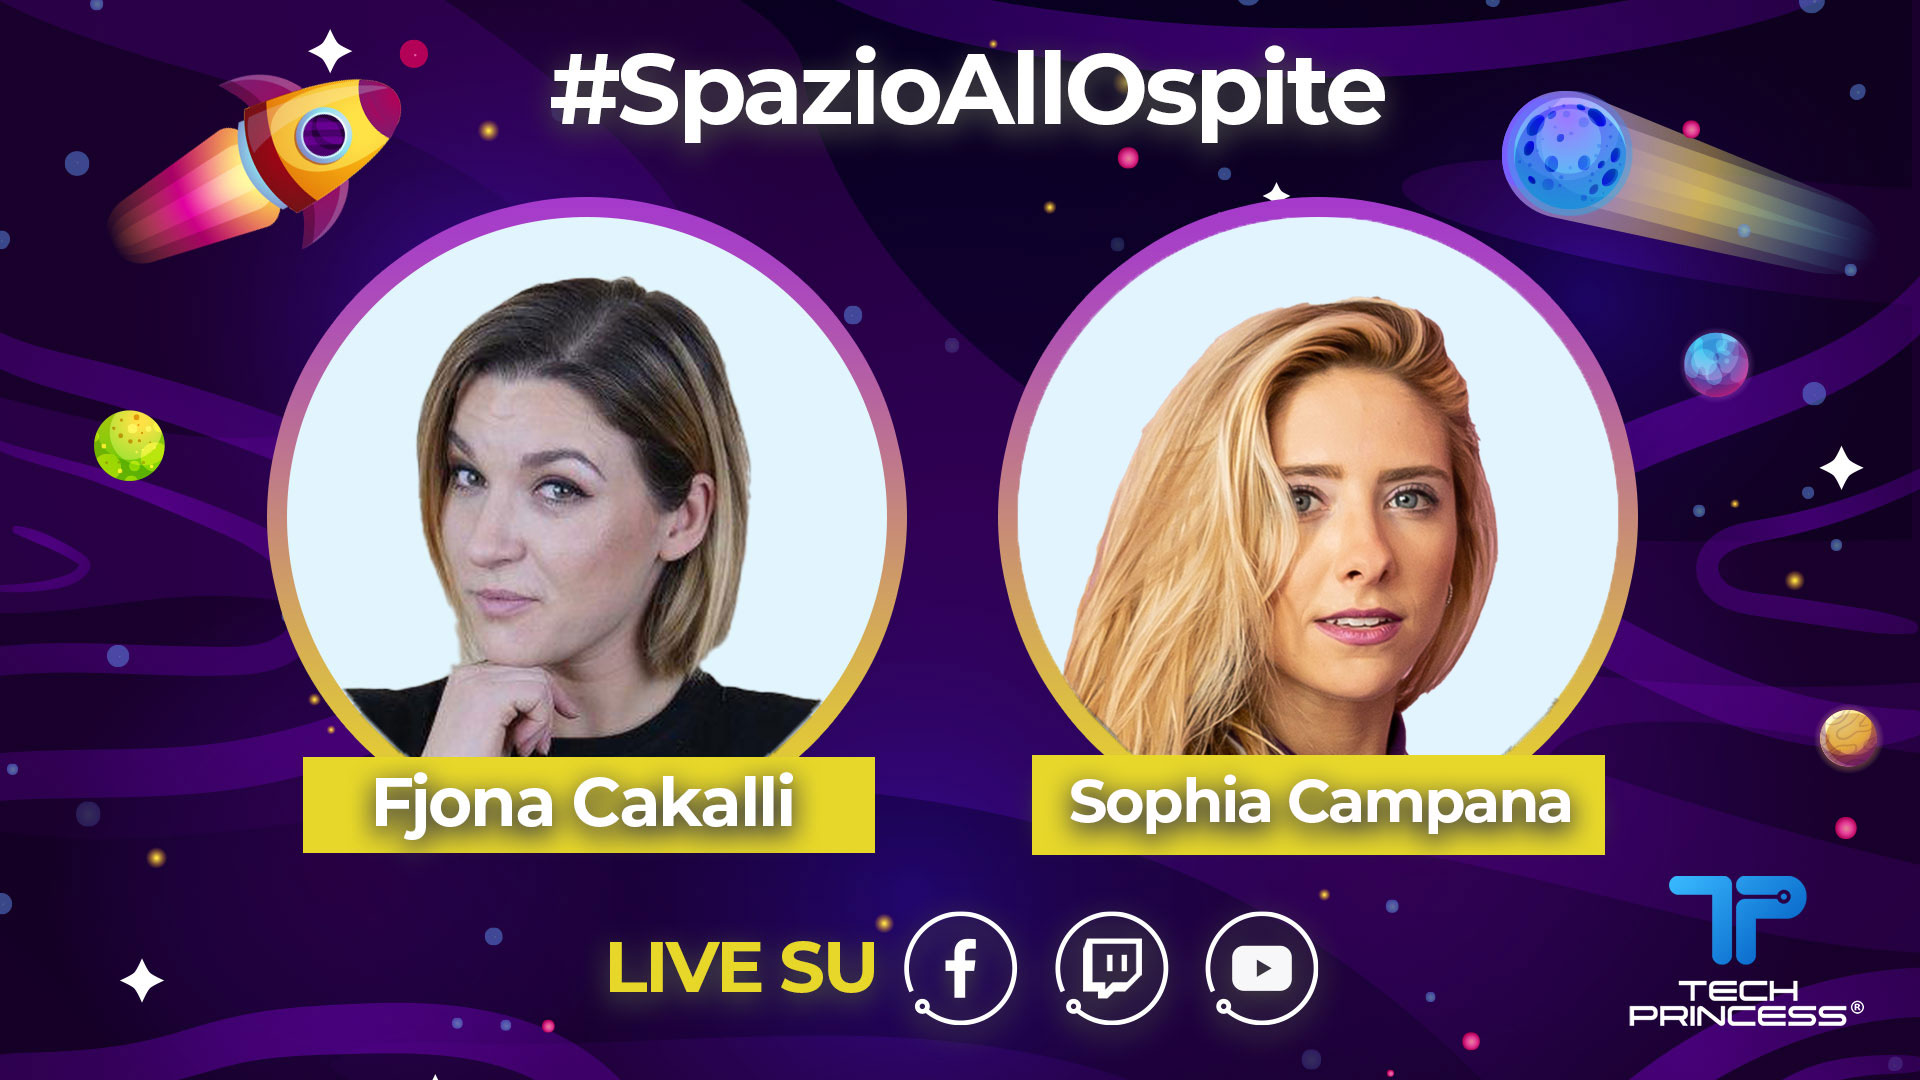 Sophia Campana, ginnasta professionista: intervista in diretta mercoledì 29 Aprile ore 18.00 | #SpazioAllOspite thumbnail